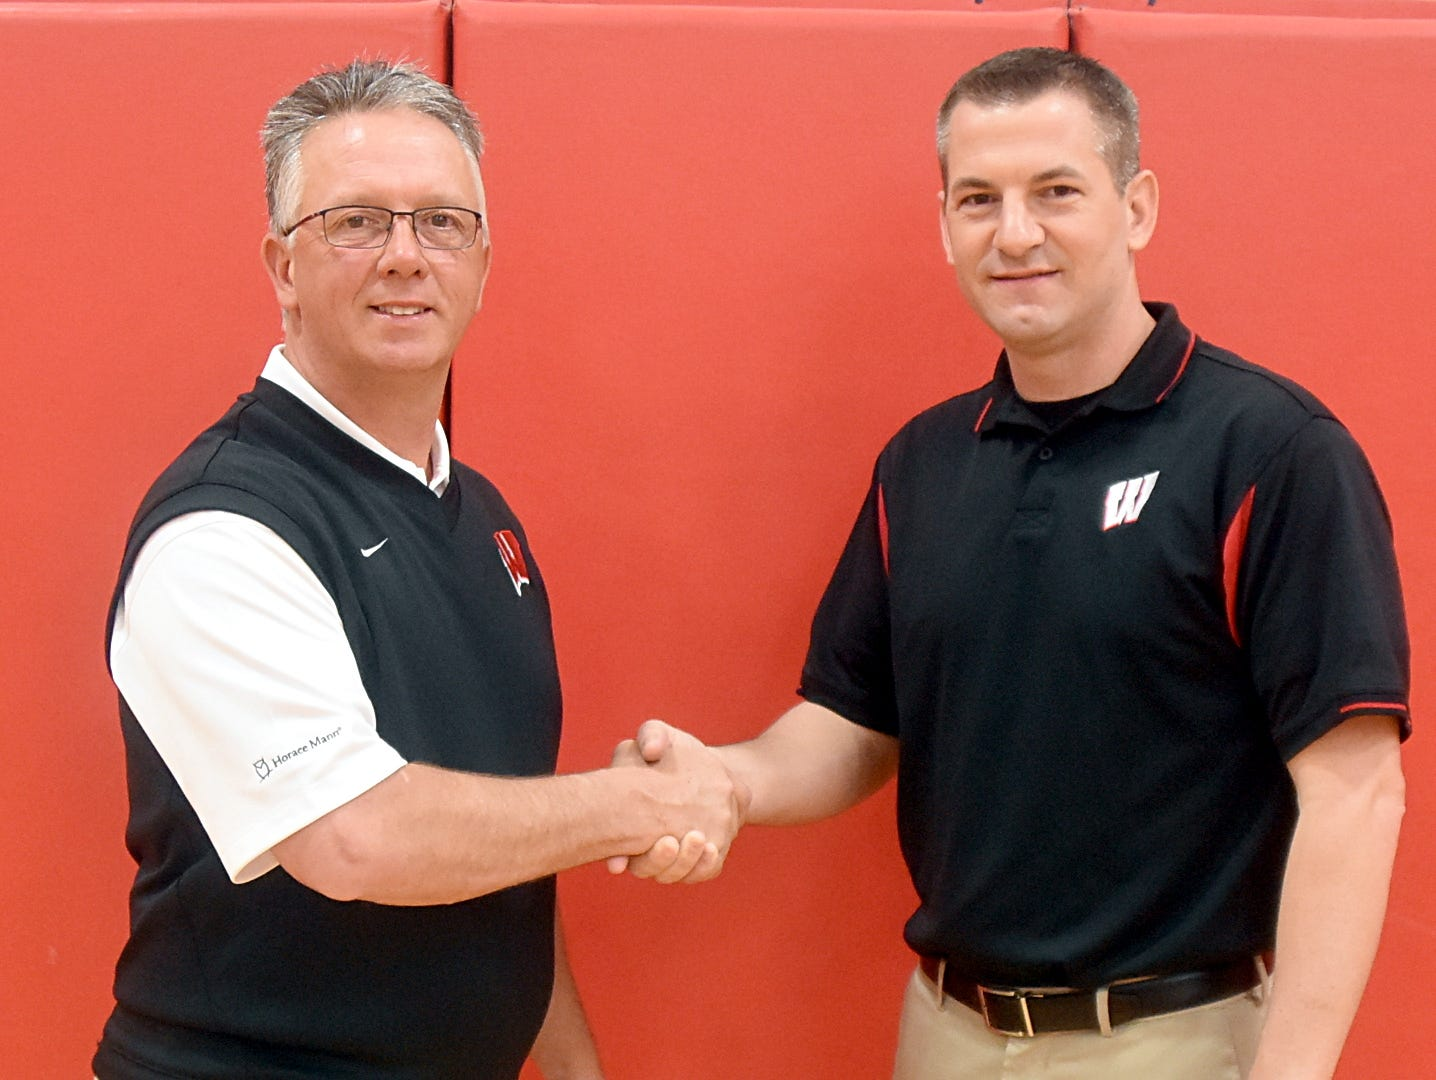 Westmoreland High principal Rick Duffer named Corey Fitzpatrick as the school's new head boys basketball coach on Friday morning.